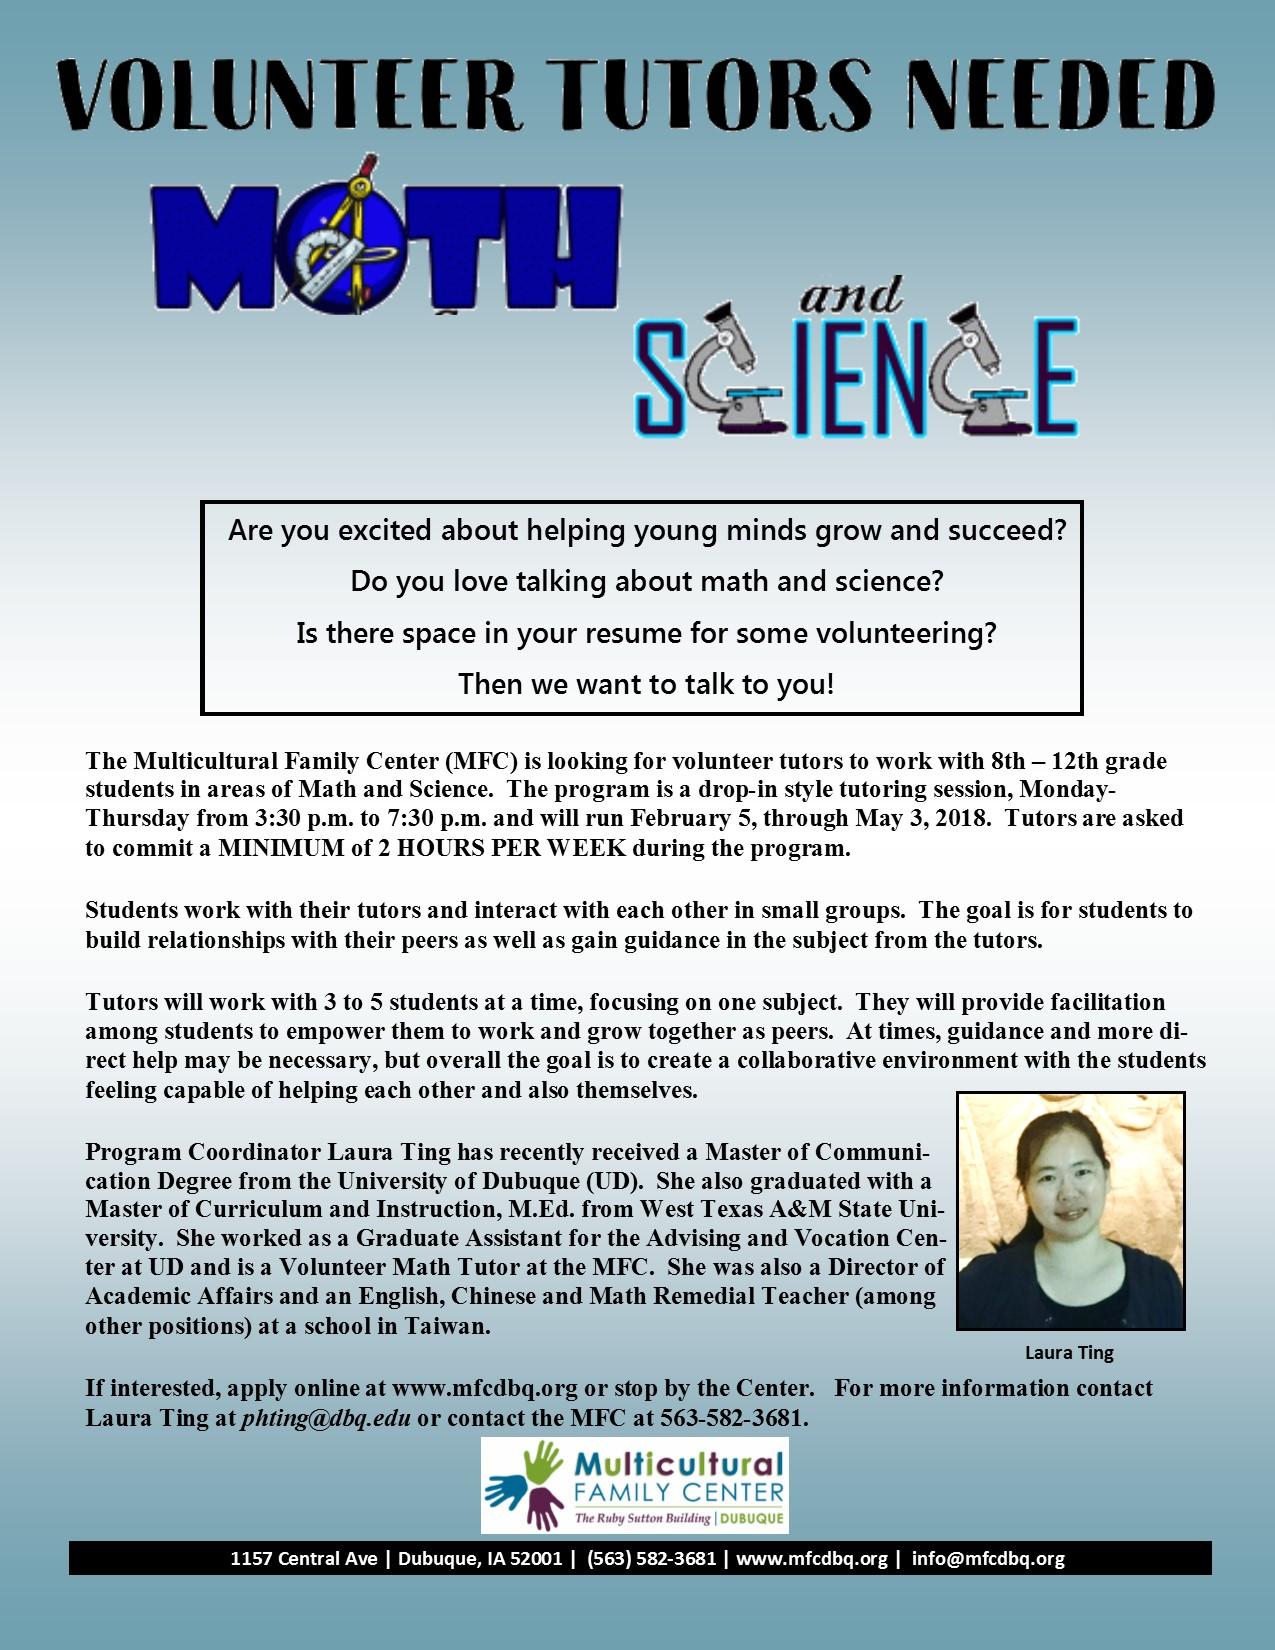 Volunteer Math & Science Tutors | Multicultural Family Center